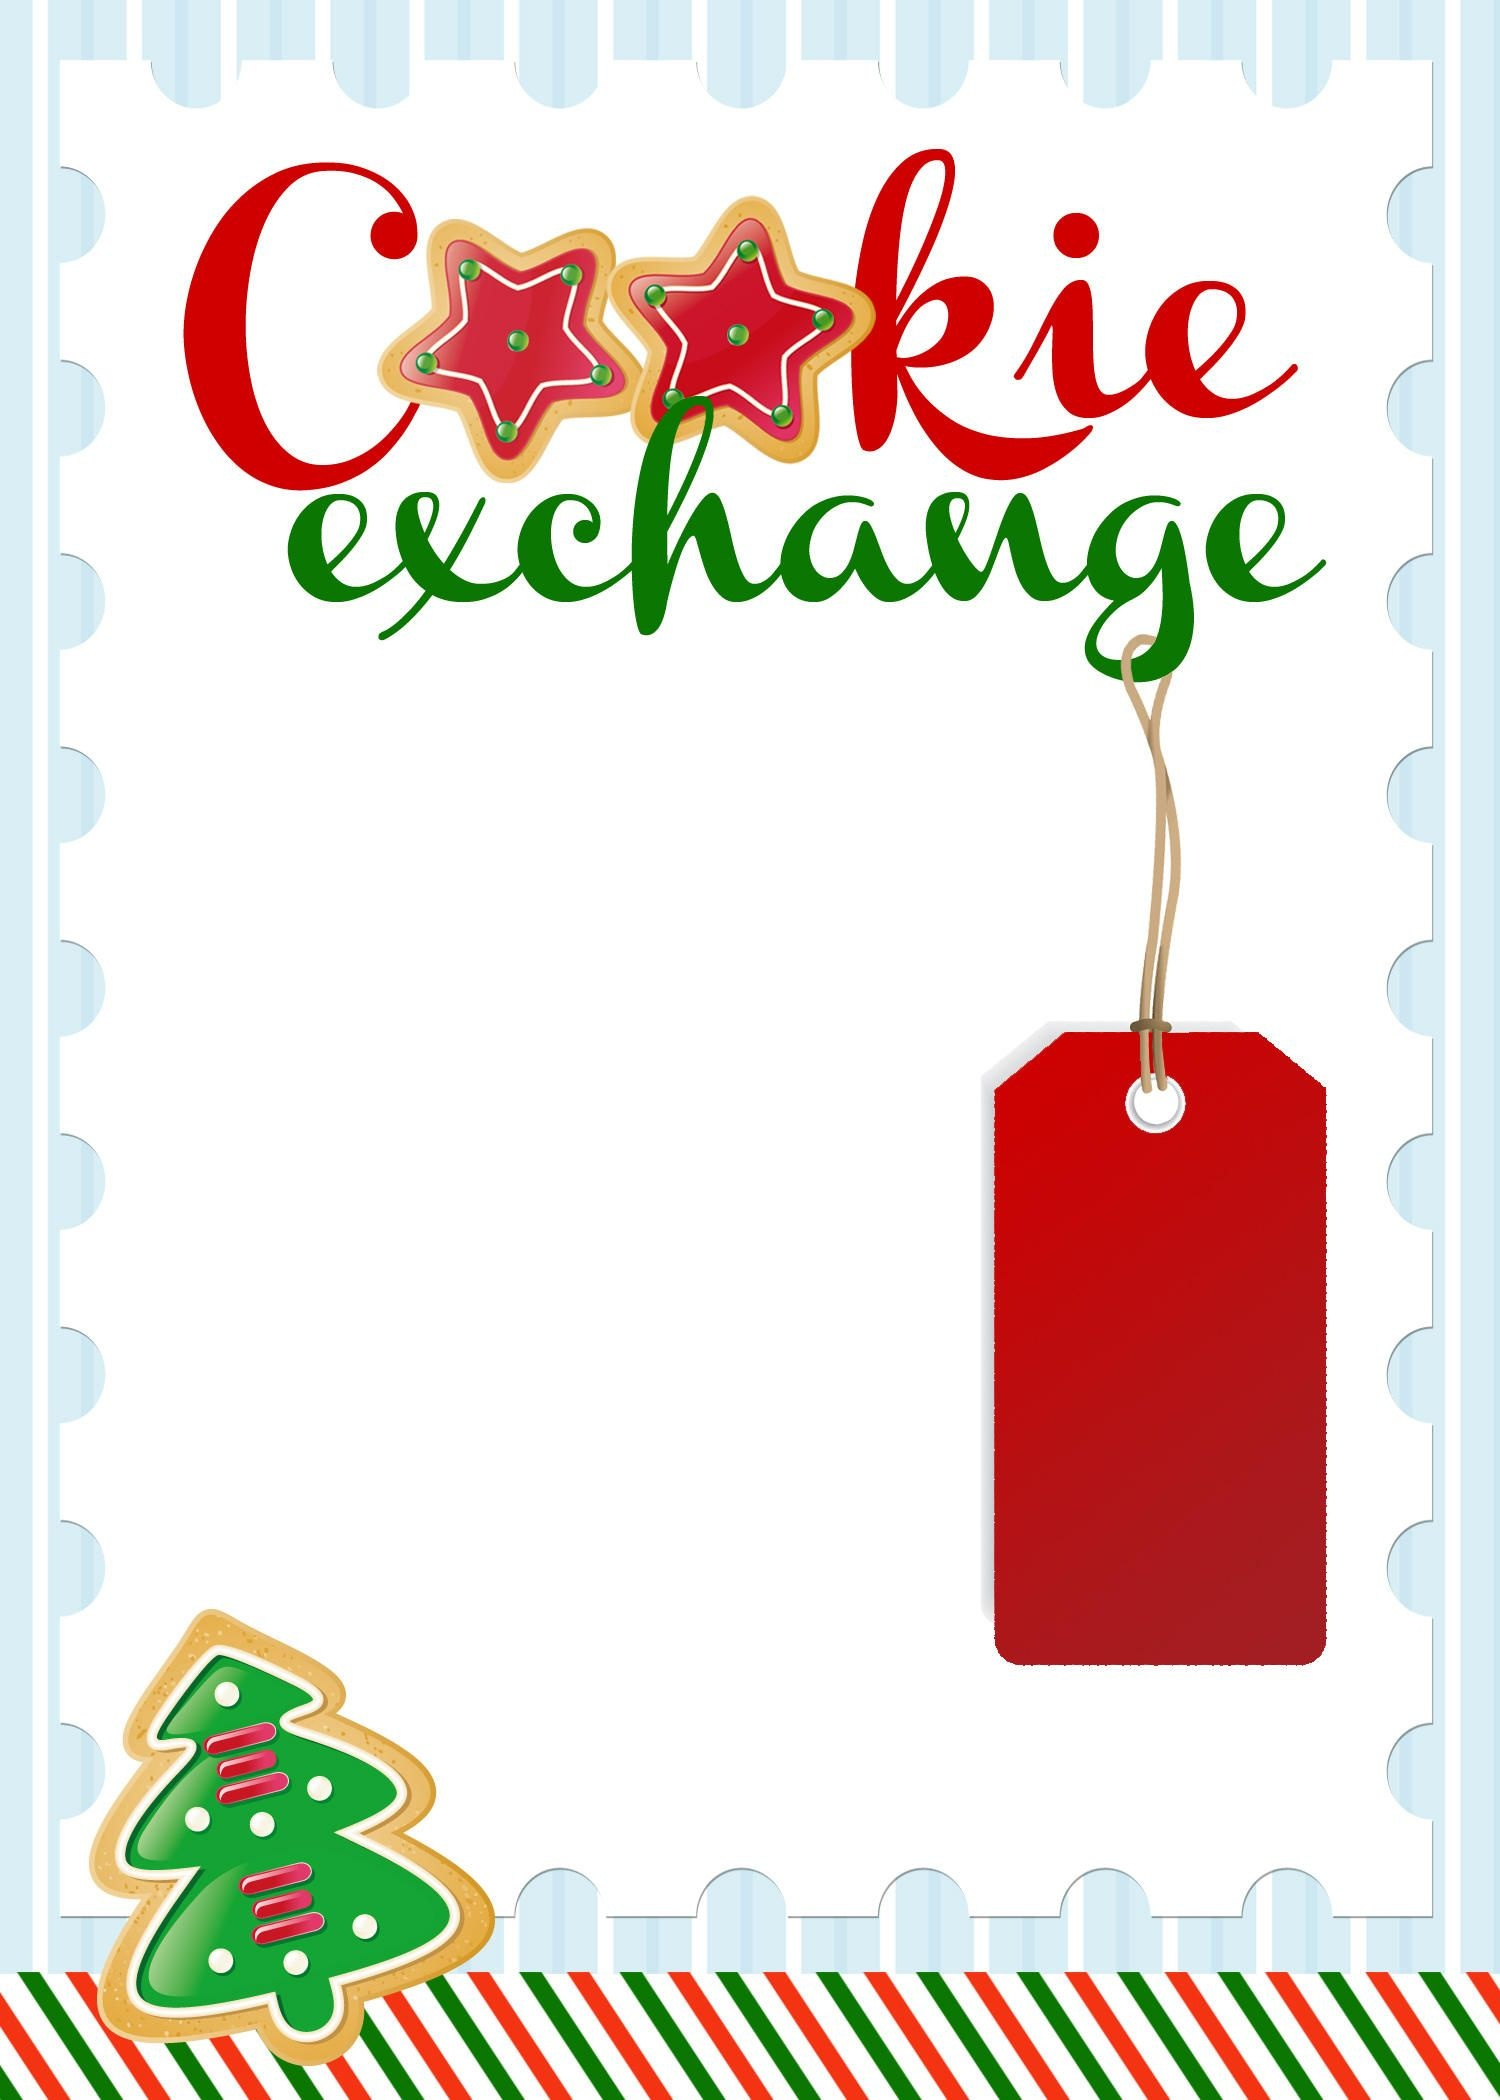 Christmas Party Invitation Templates Free Printable | Pretty - Christmas Party Invitation Templates Free Printable